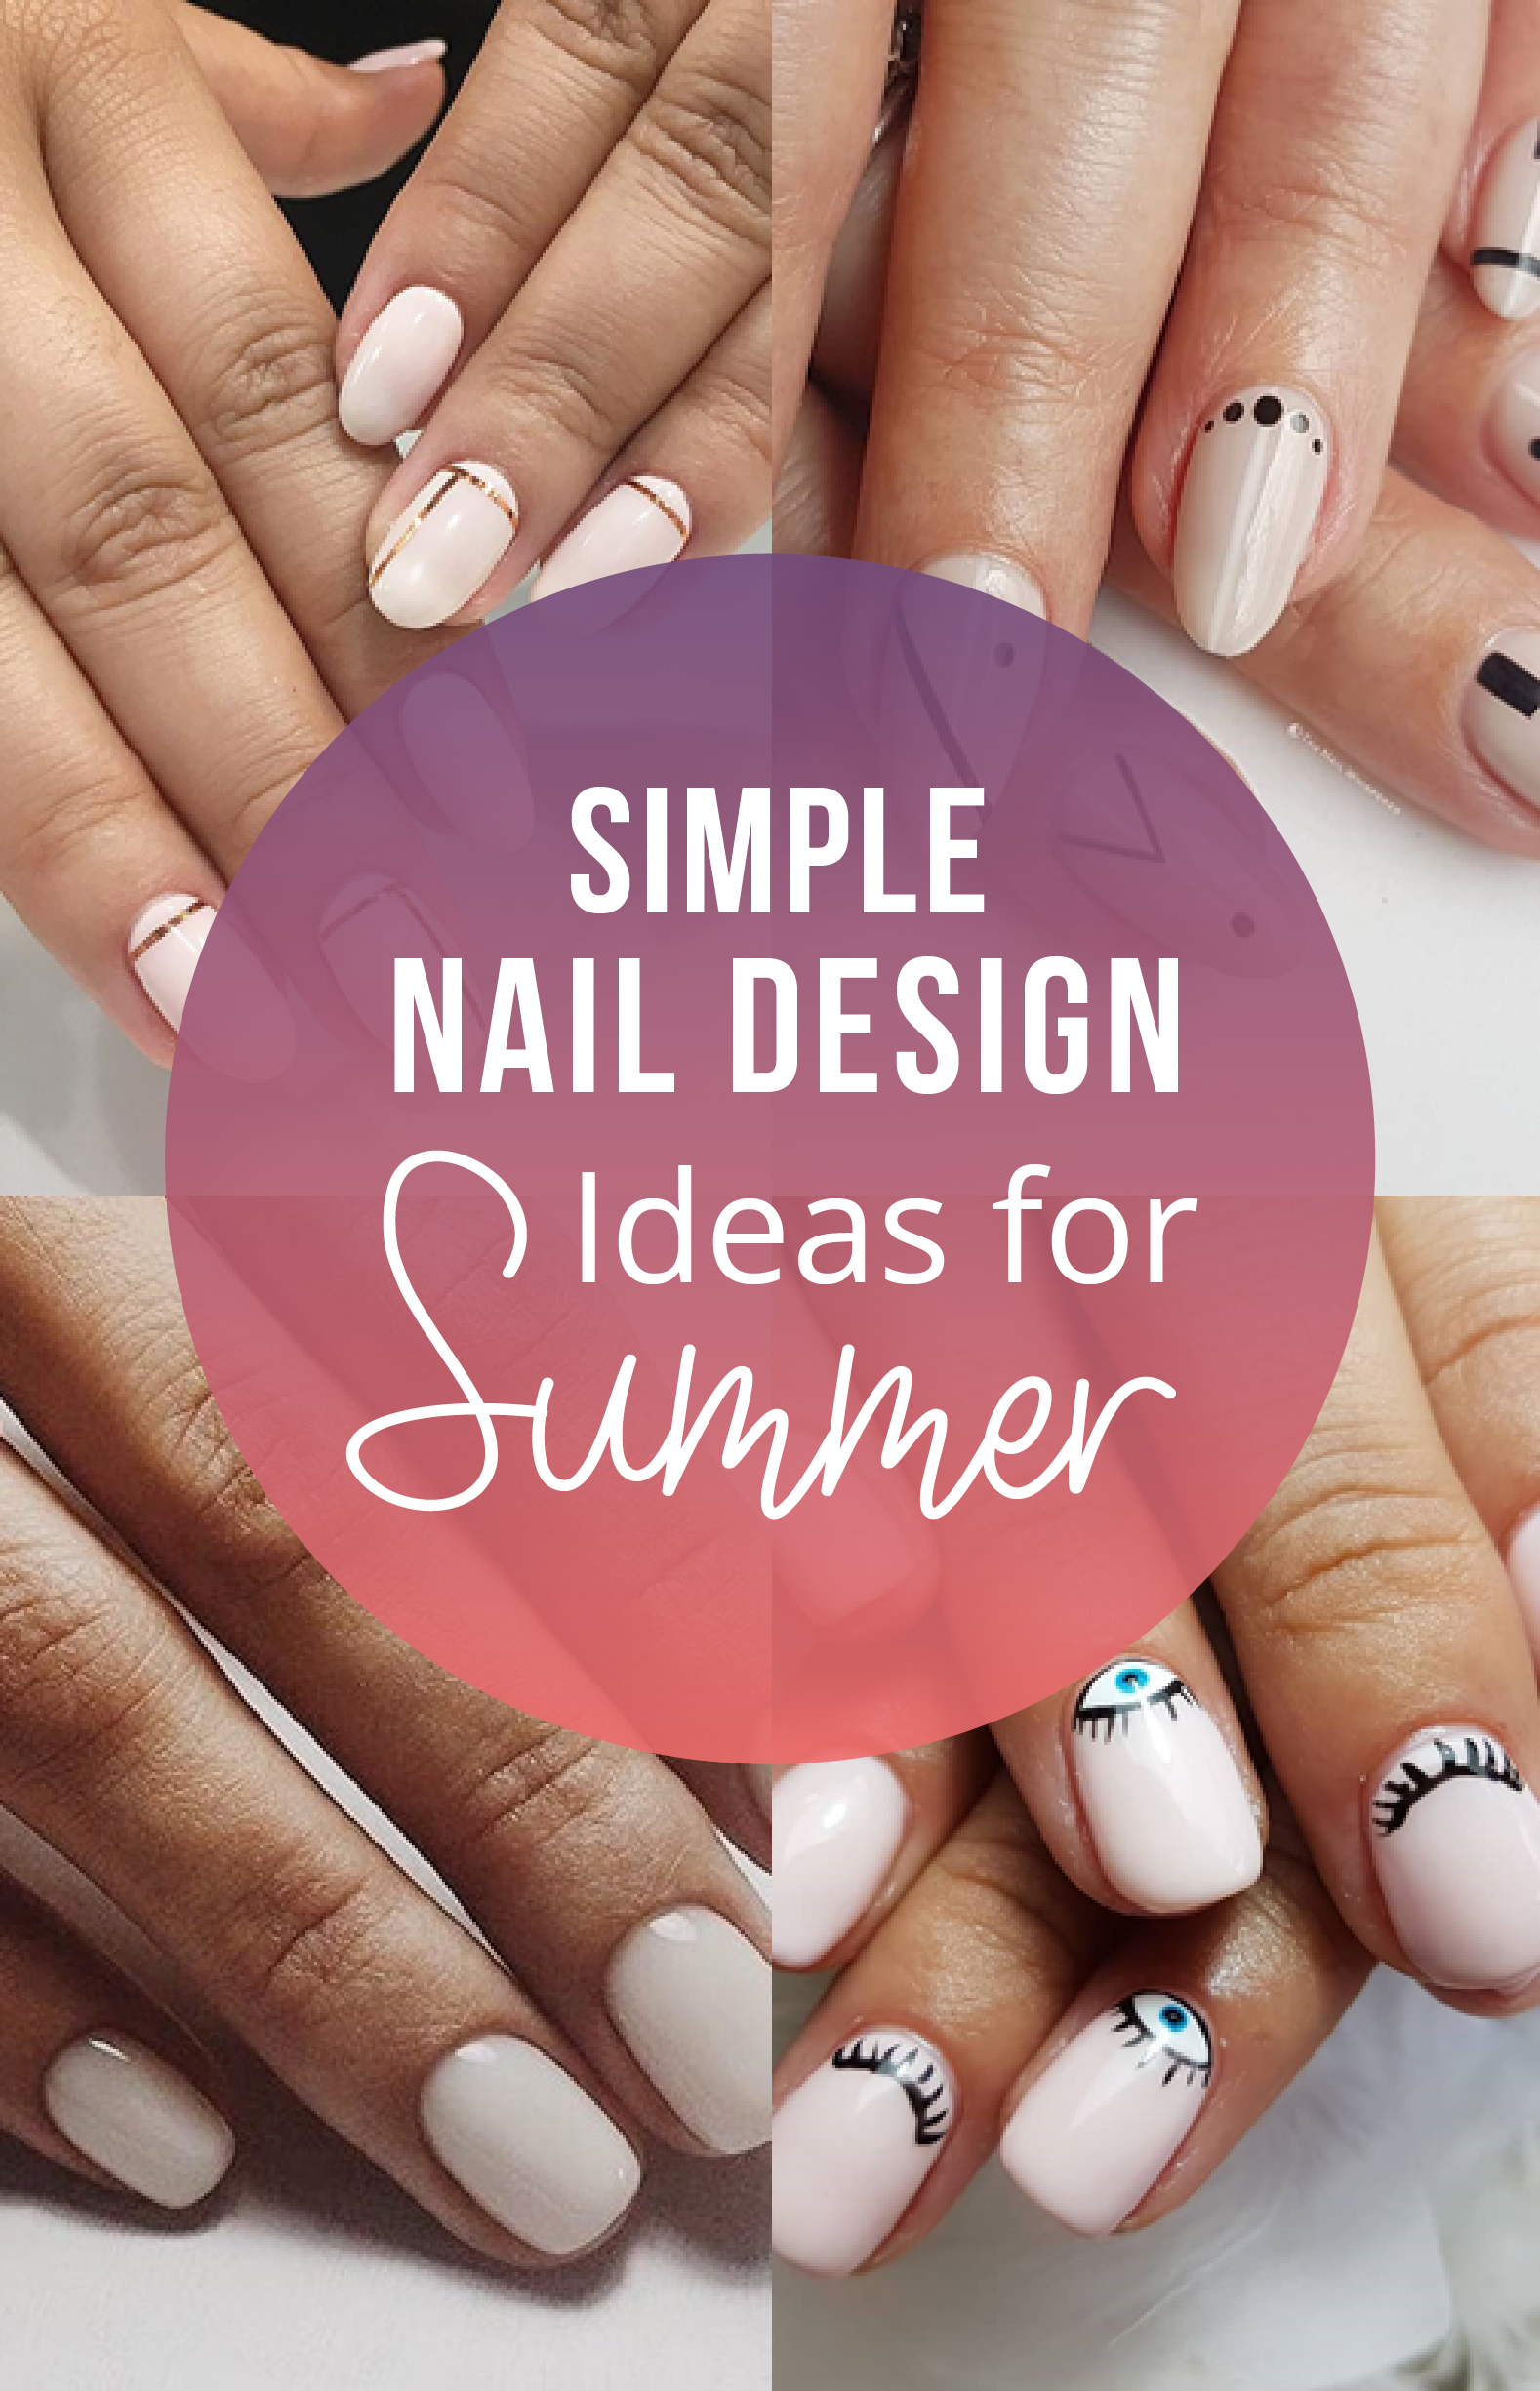 simple nail designs ideas for summer summer nail designs